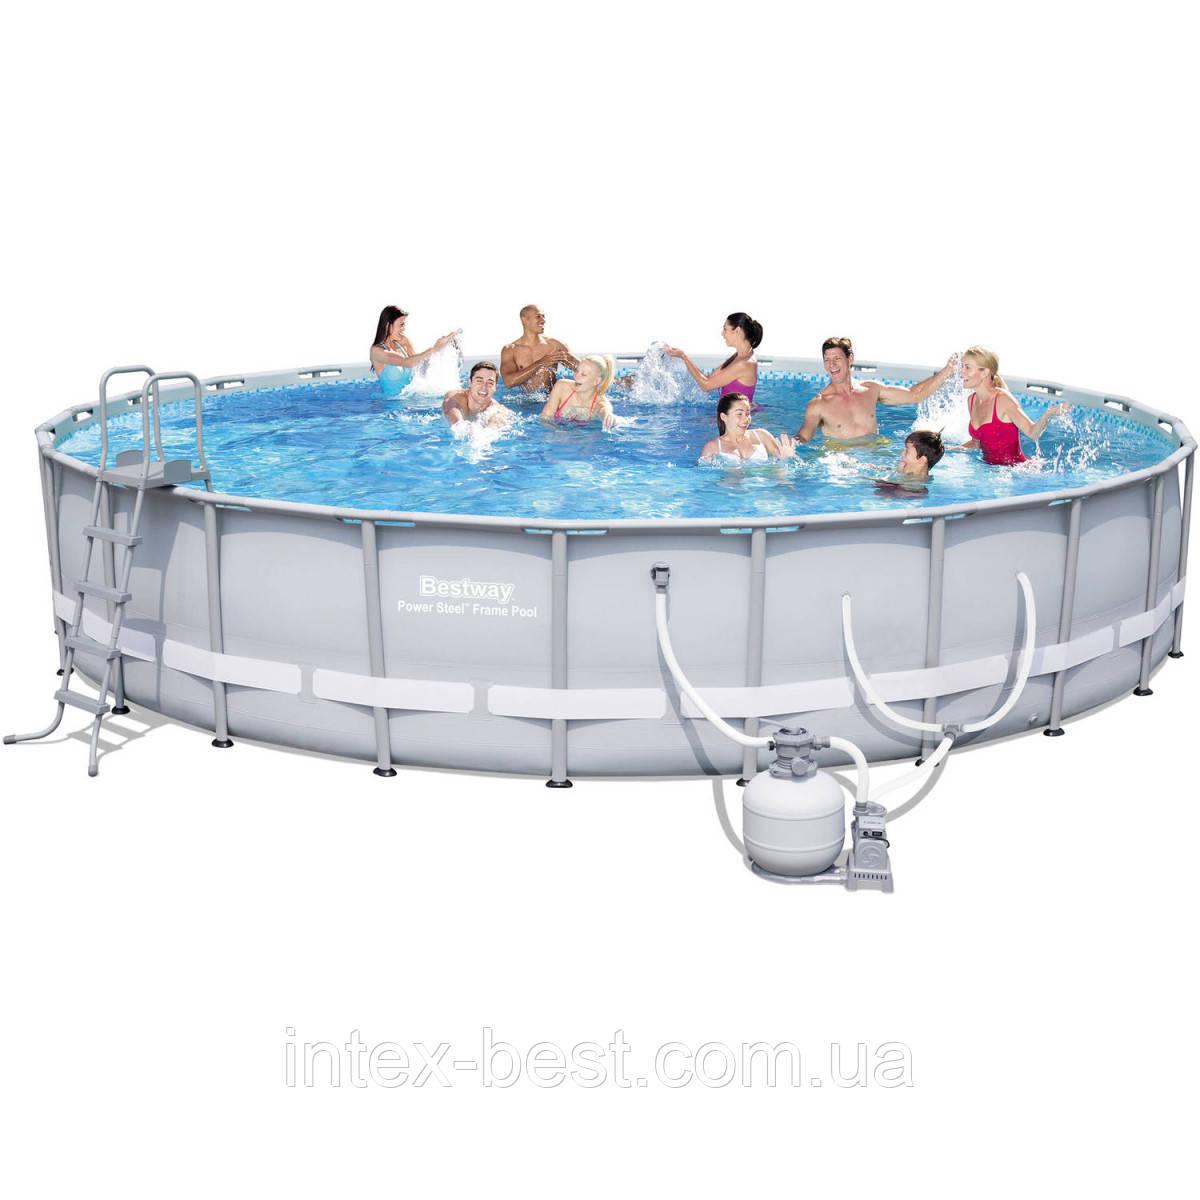 Bestway 56634 - круглый каркасный бассейн Power Steel Frame 671х132 см